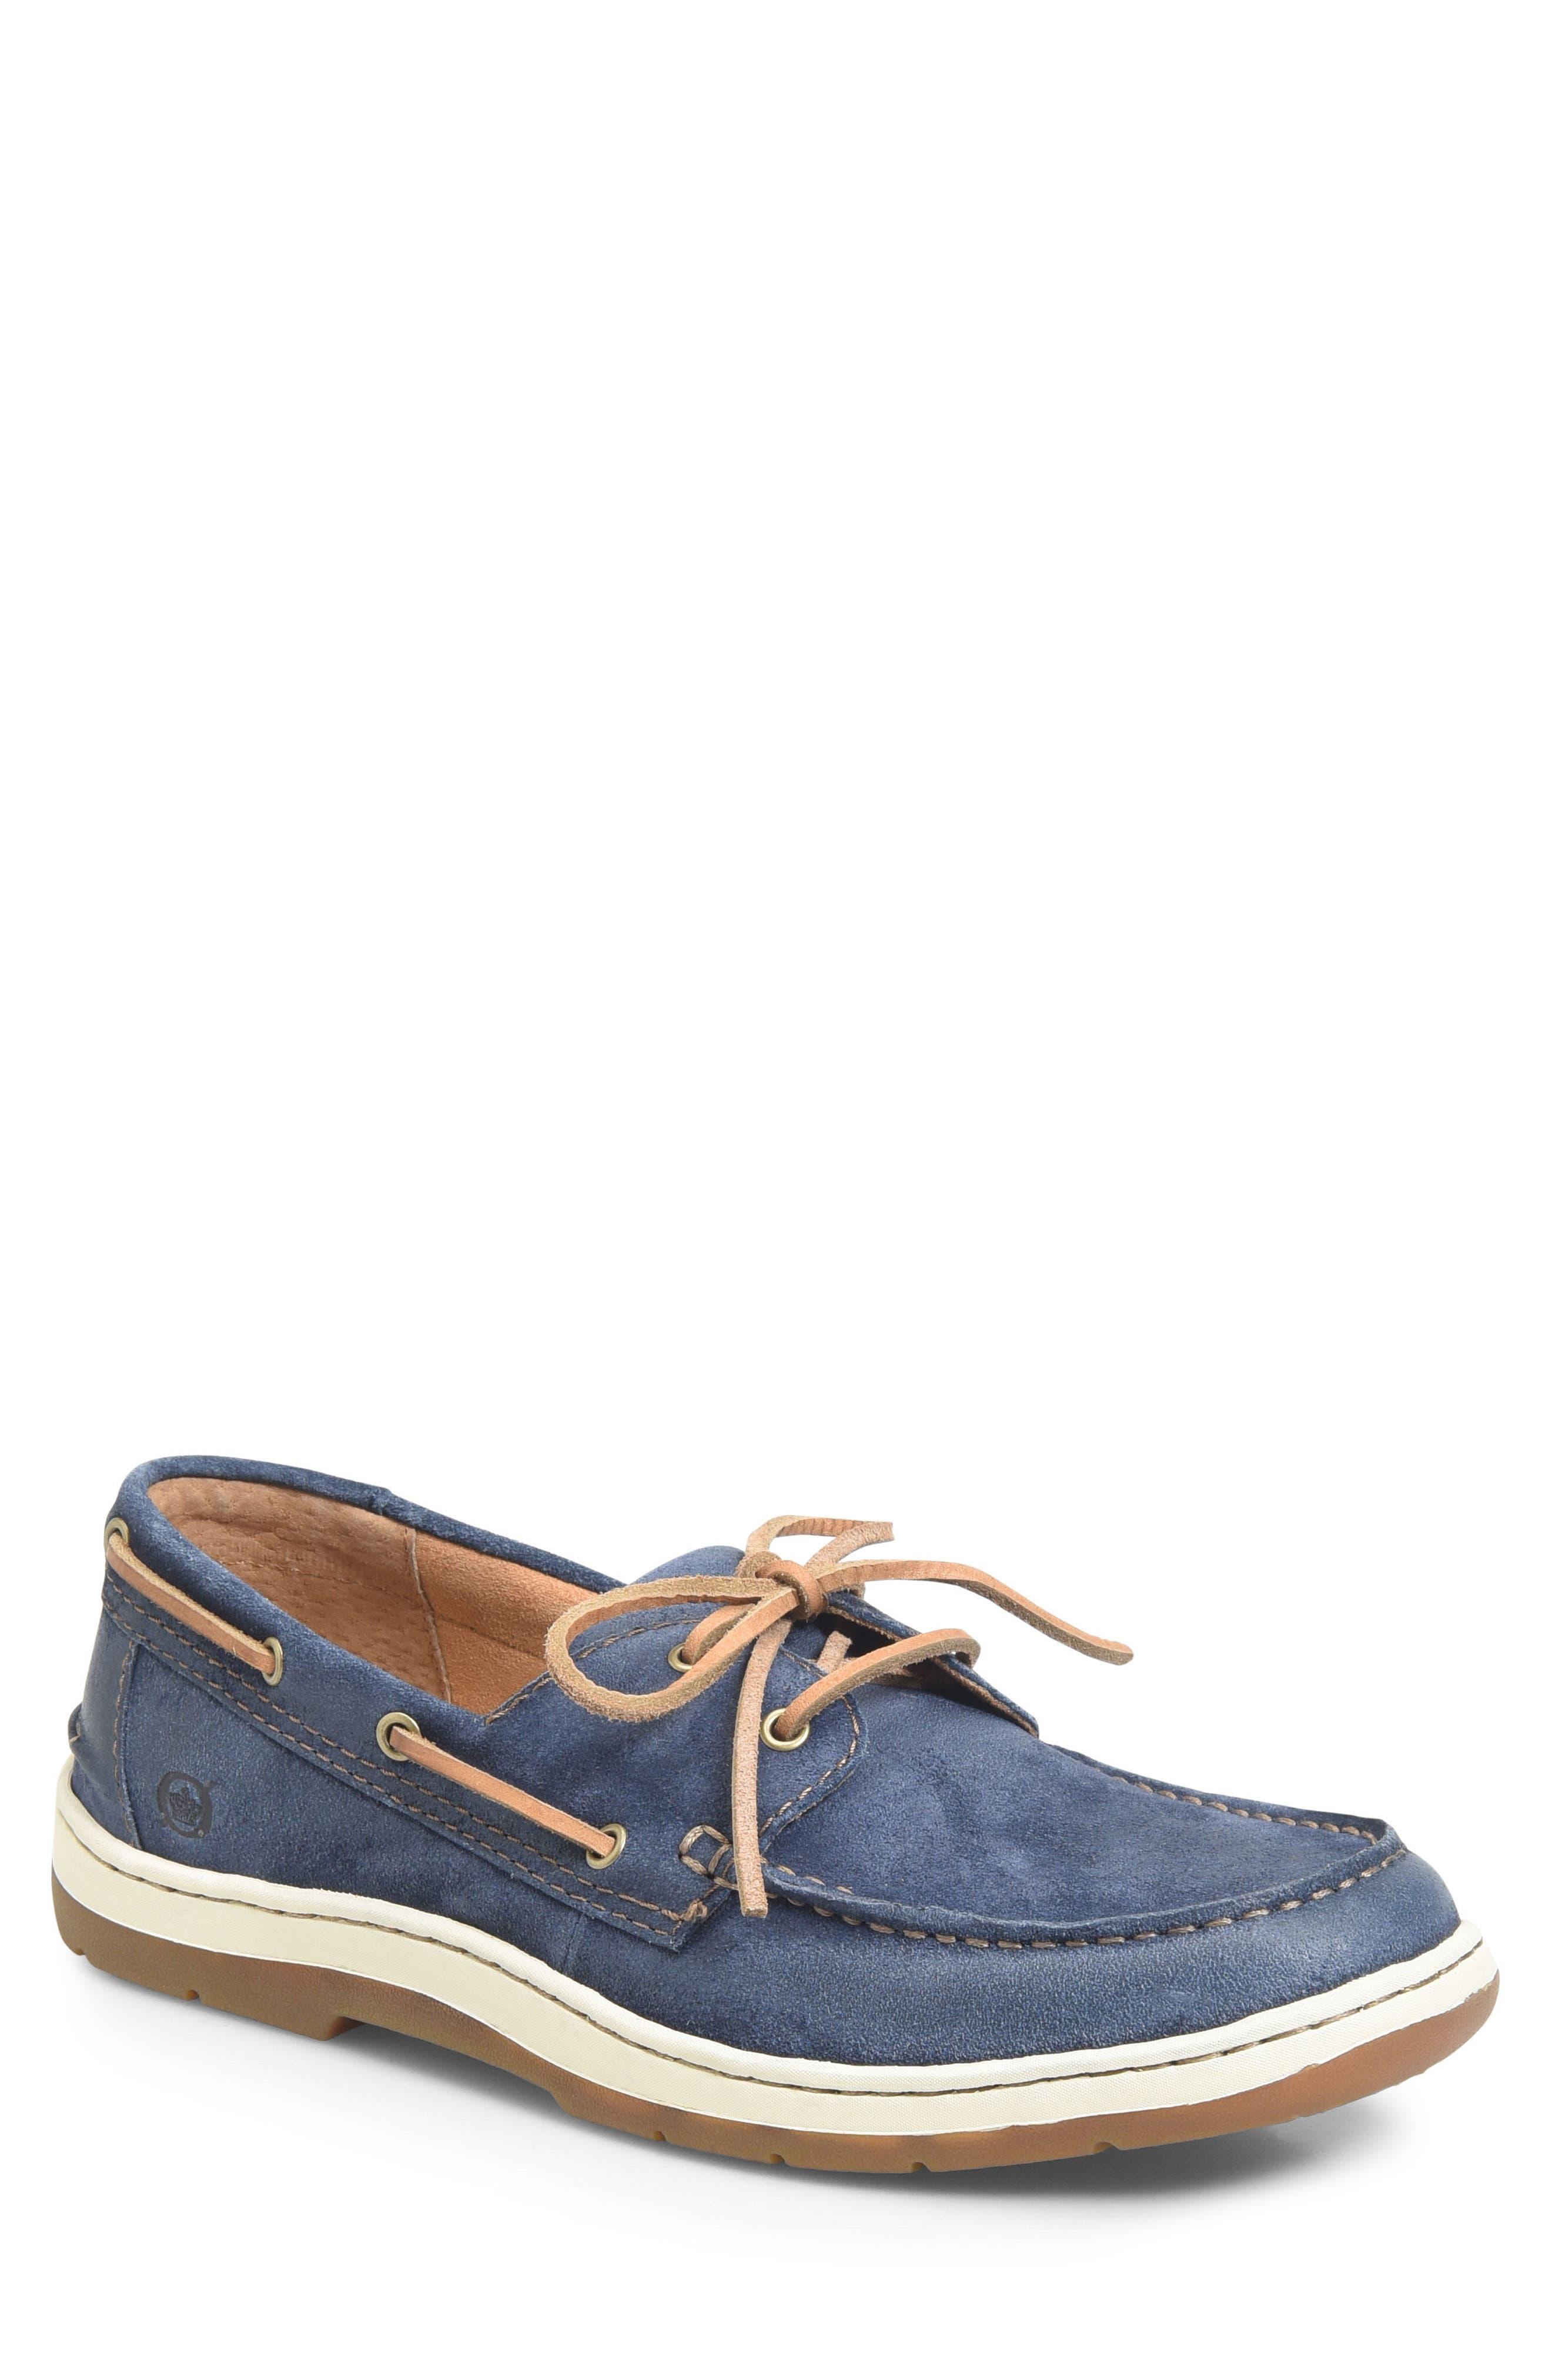 Ocean Boat Shoe,                             Main thumbnail 1, color,                             Dark Blue Leather